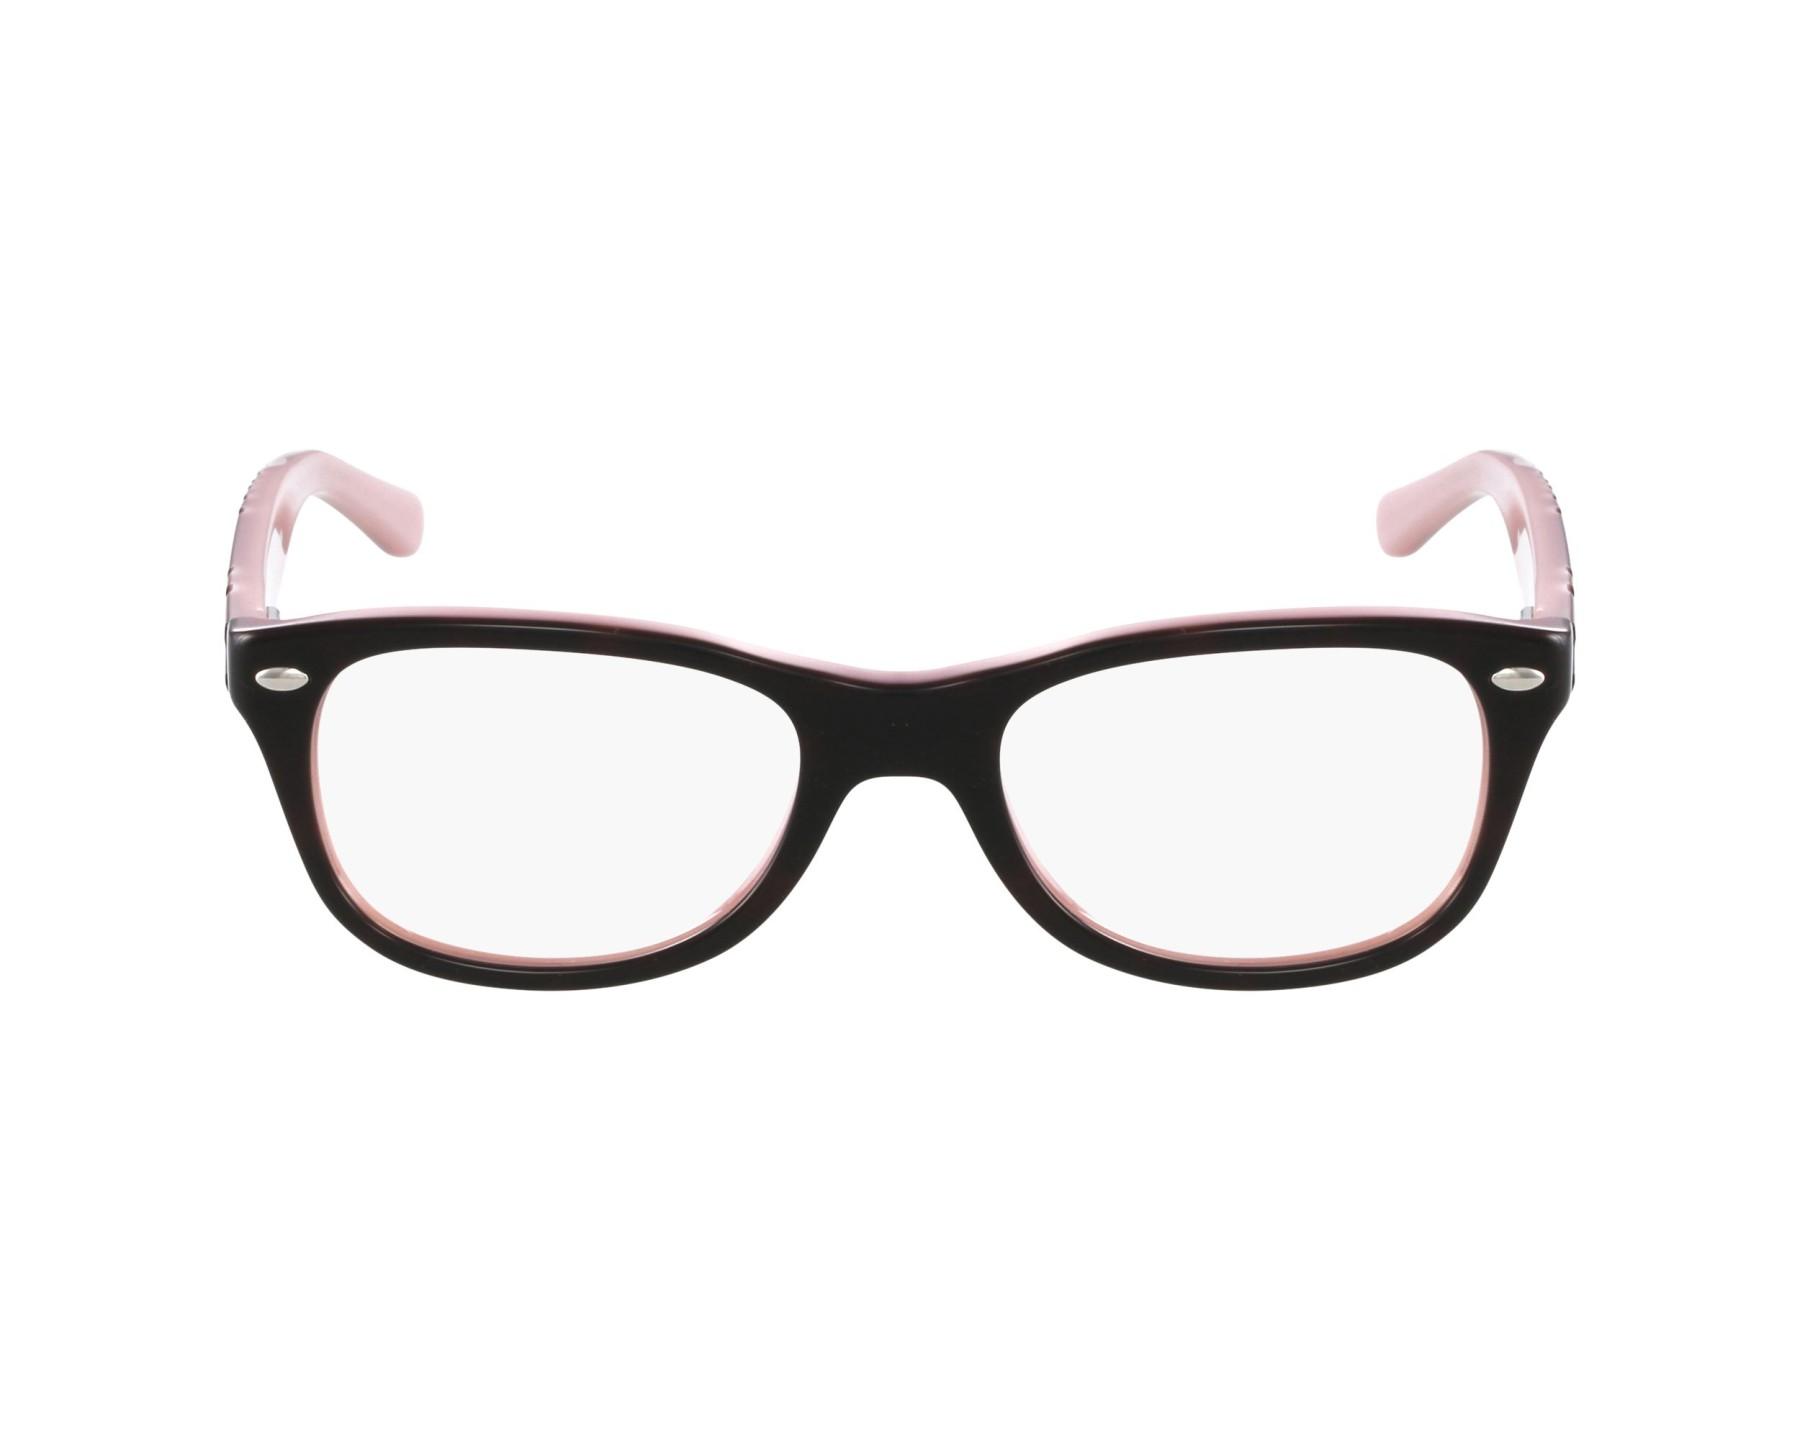 2df56d568a06d9 eyeglasses Ray-Ban RY-1544 3580 48-18 Black Purple profile view